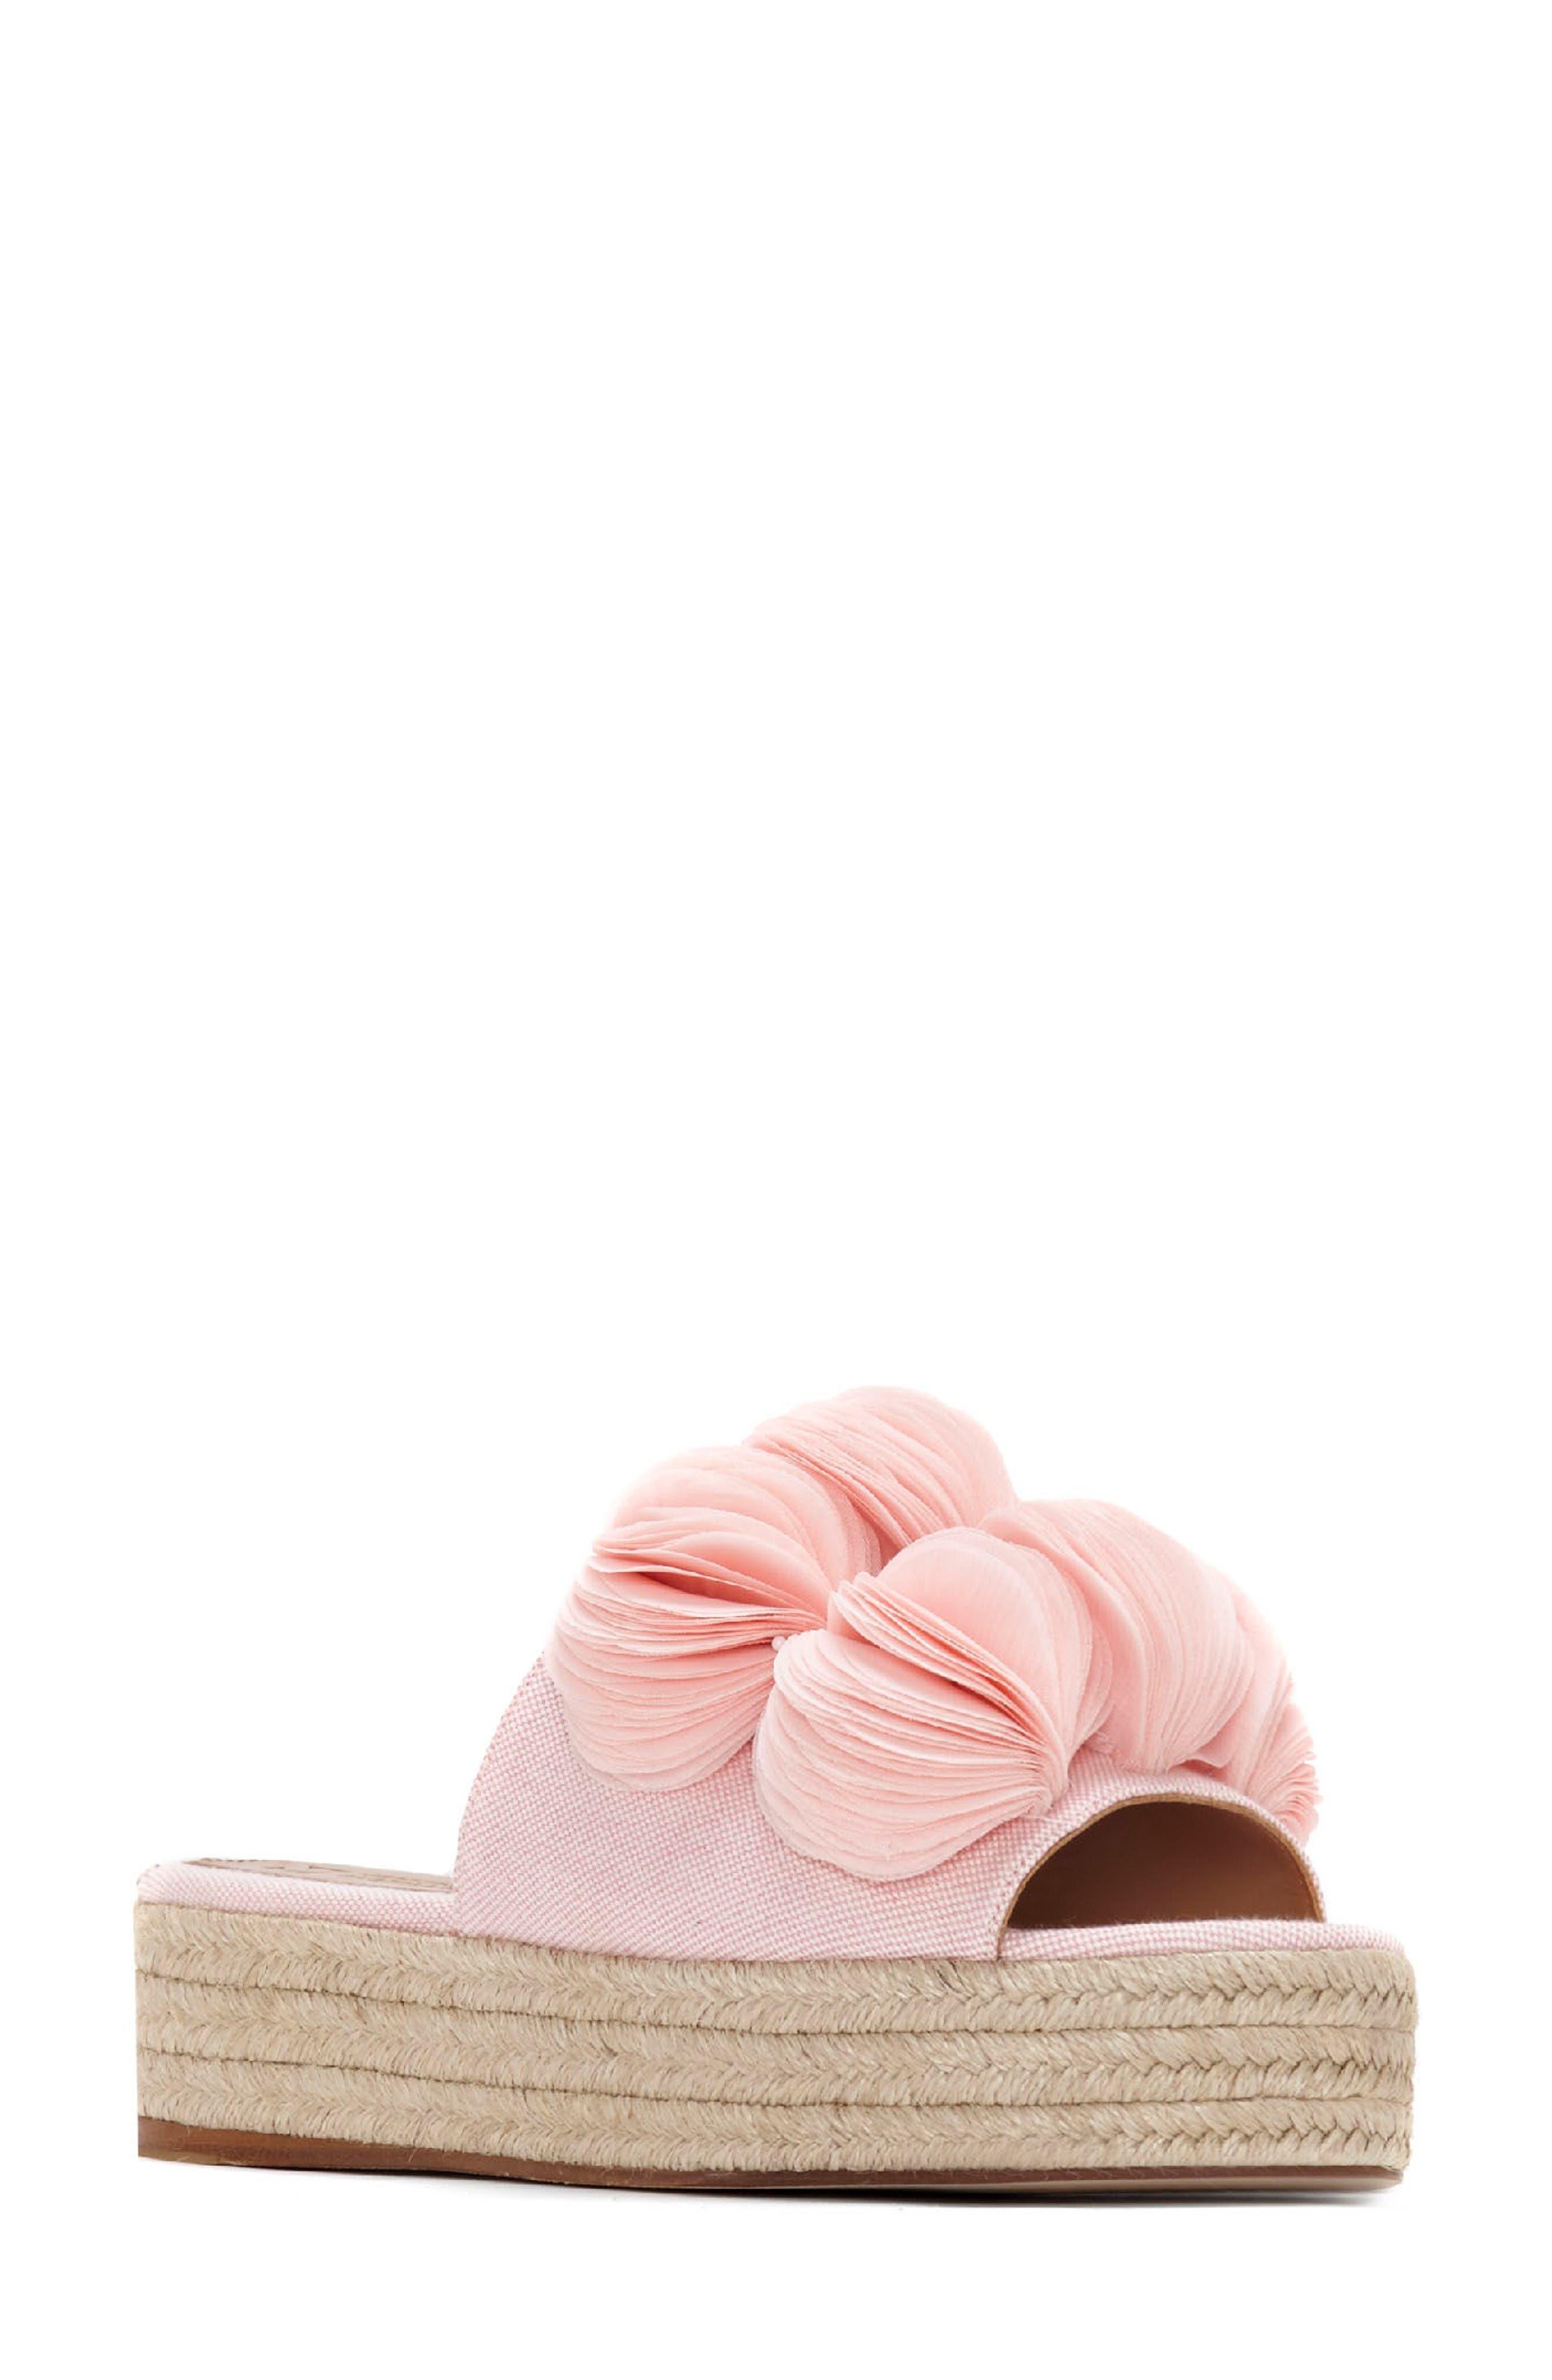 Alternate Image 1 Selected - Mercedes Castillo Espadrille Platform Sandal (Women)